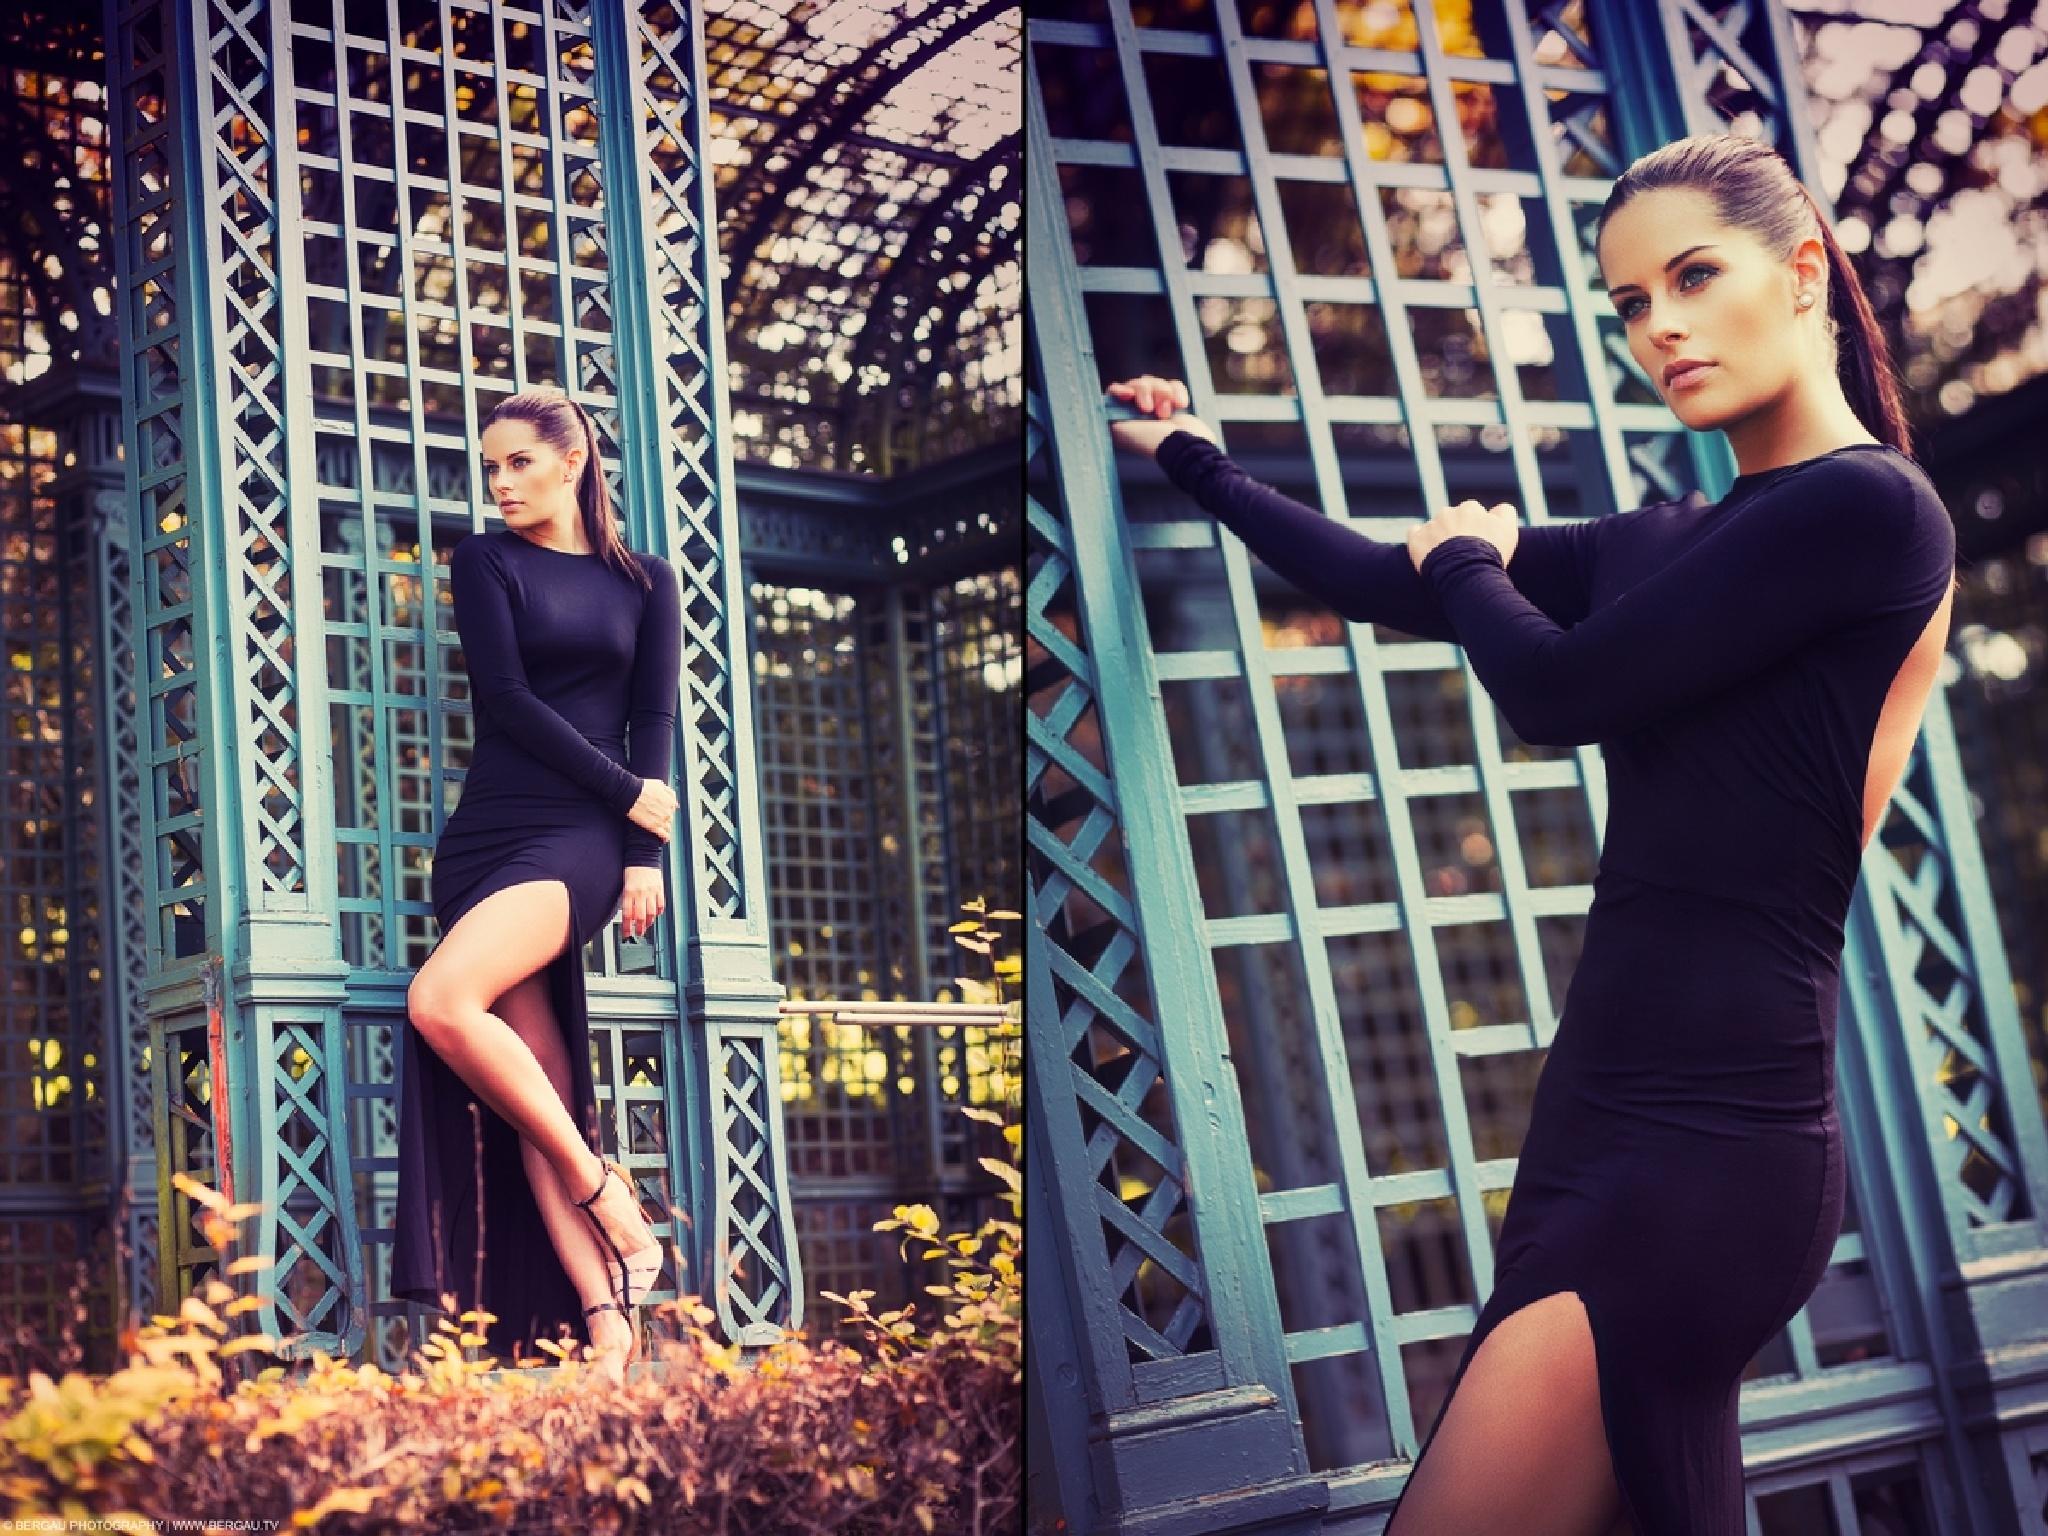 Sabrina by Bergau Photography